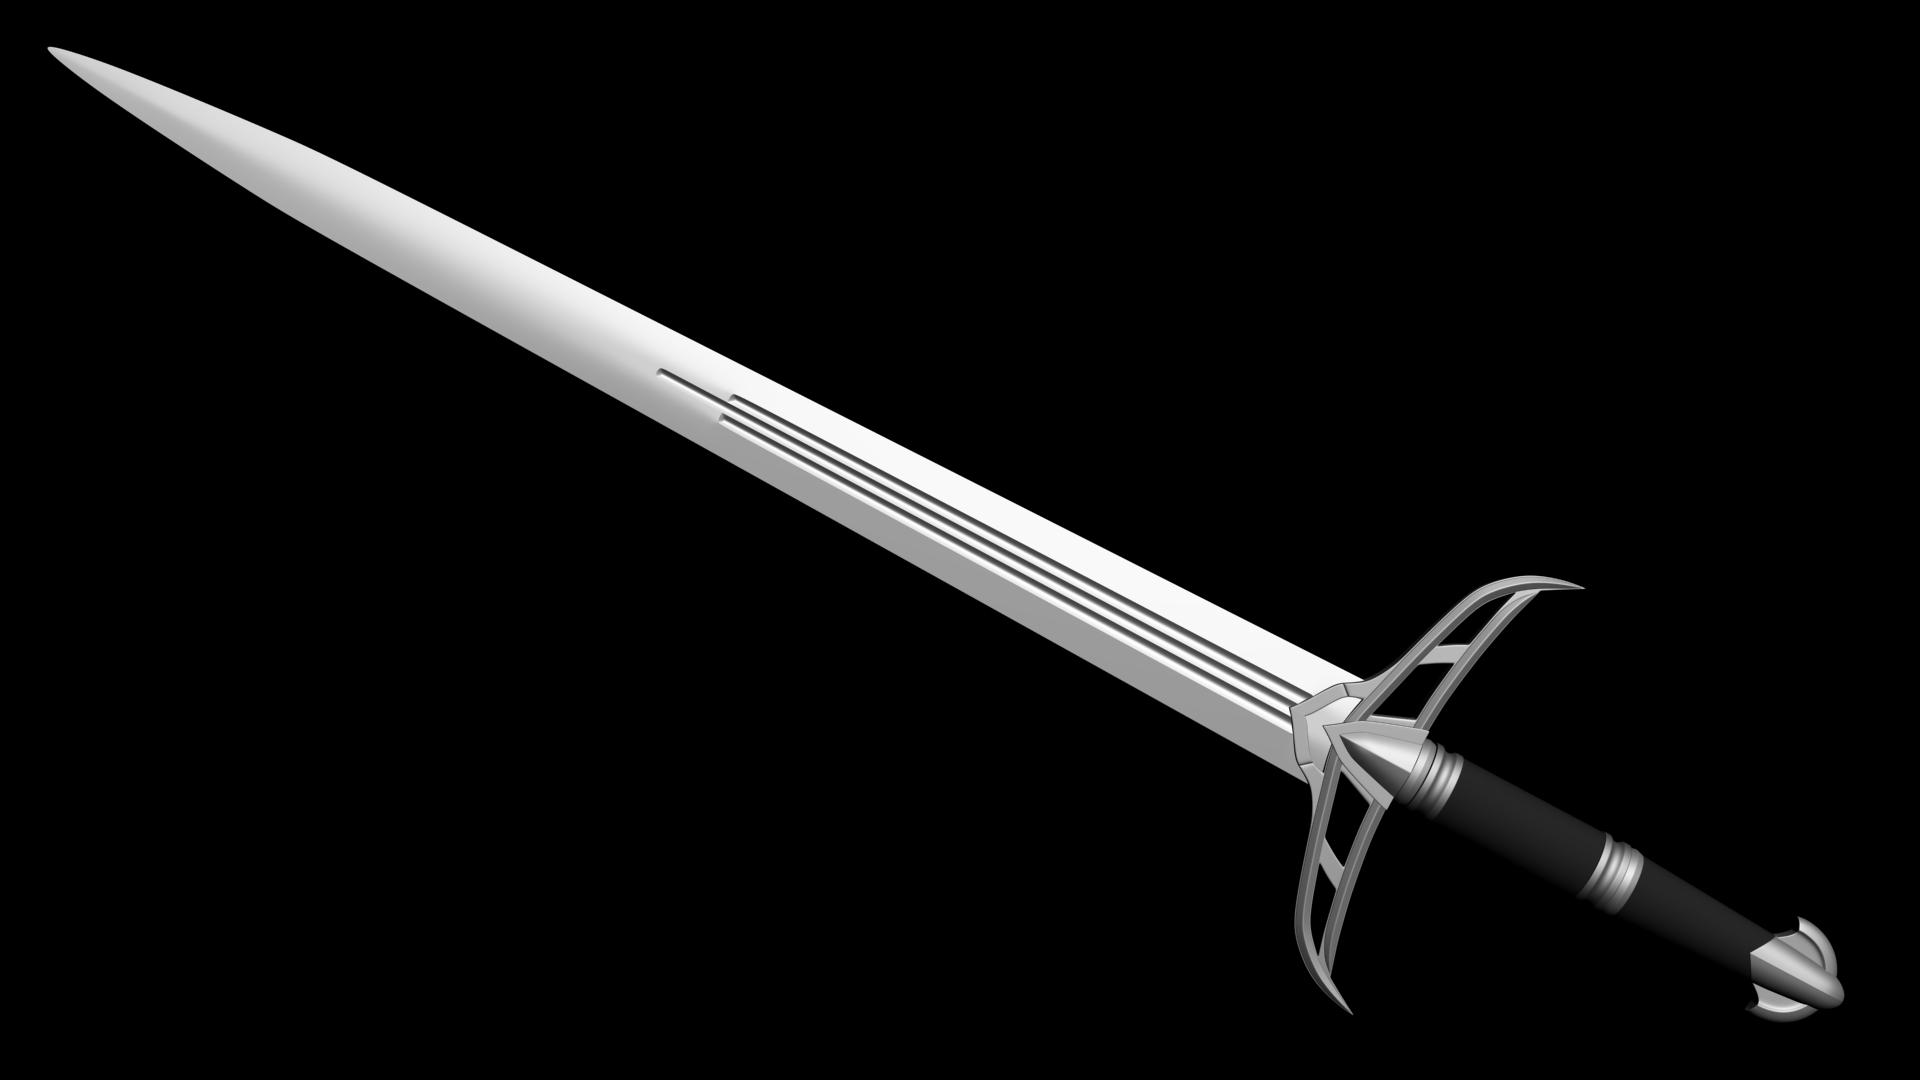 Swords PNG free download images, sword PNG.